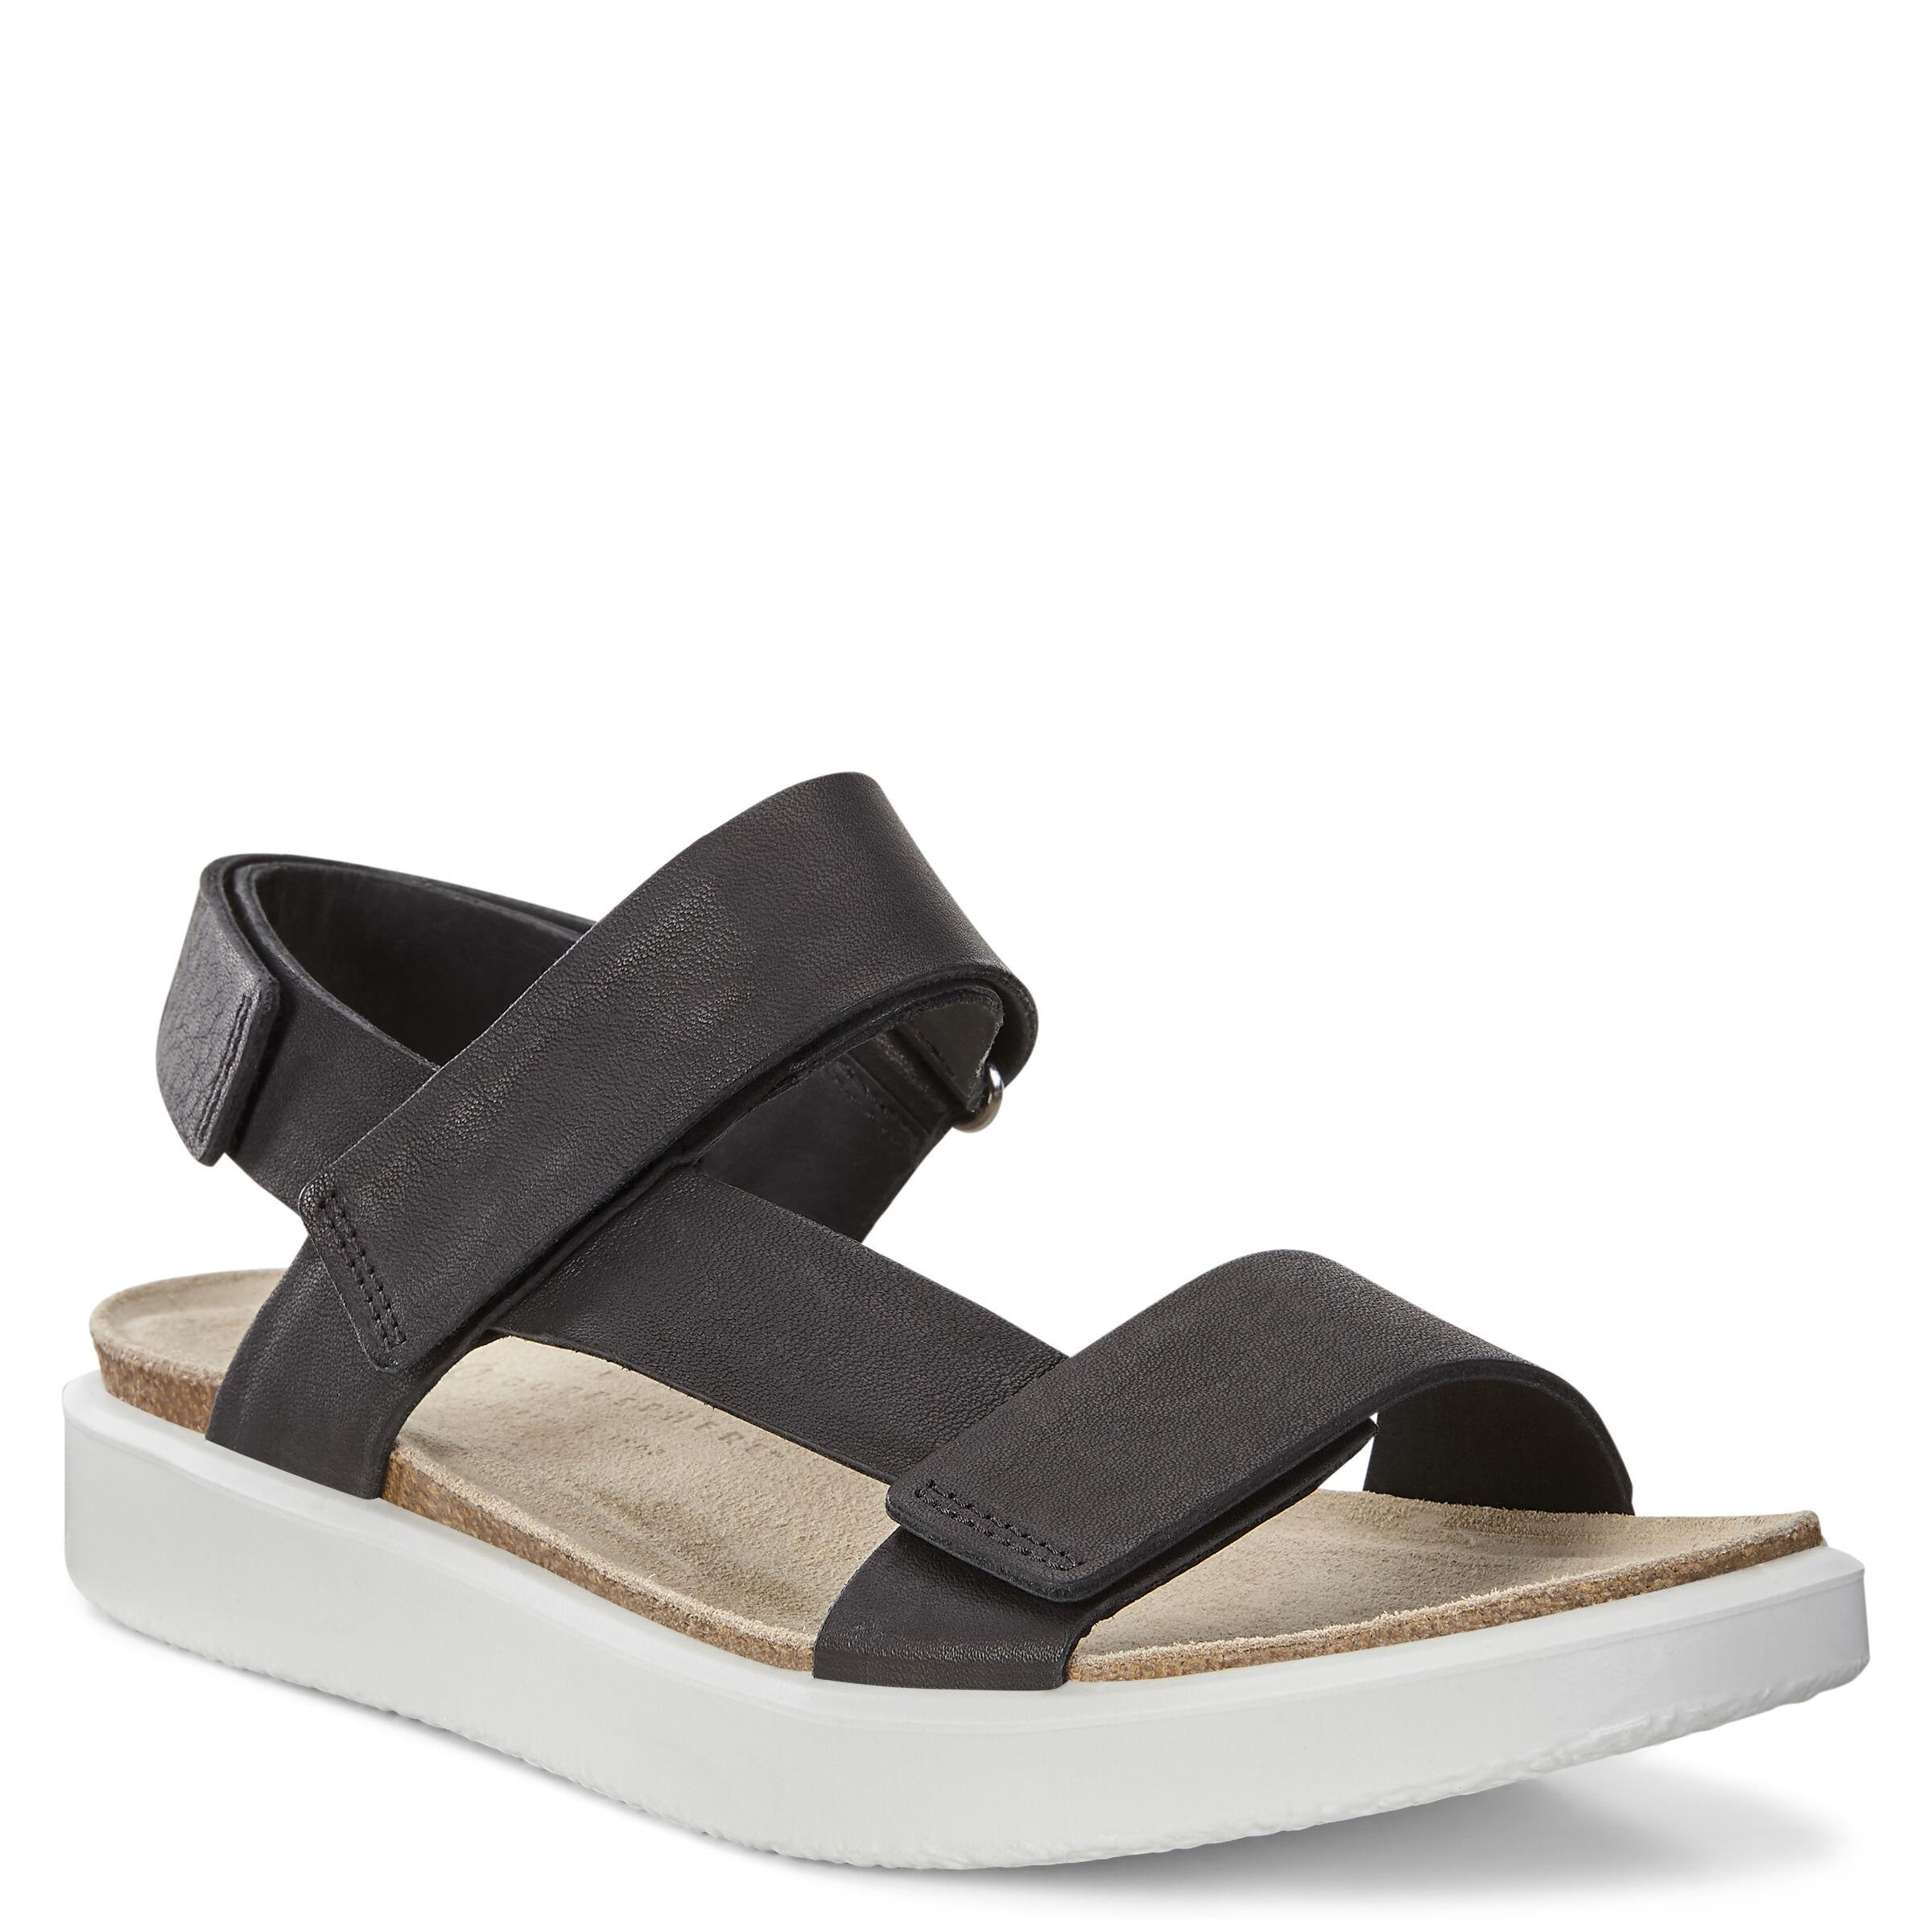 ecco corksphere sandal Sale,up to 63% Discounts